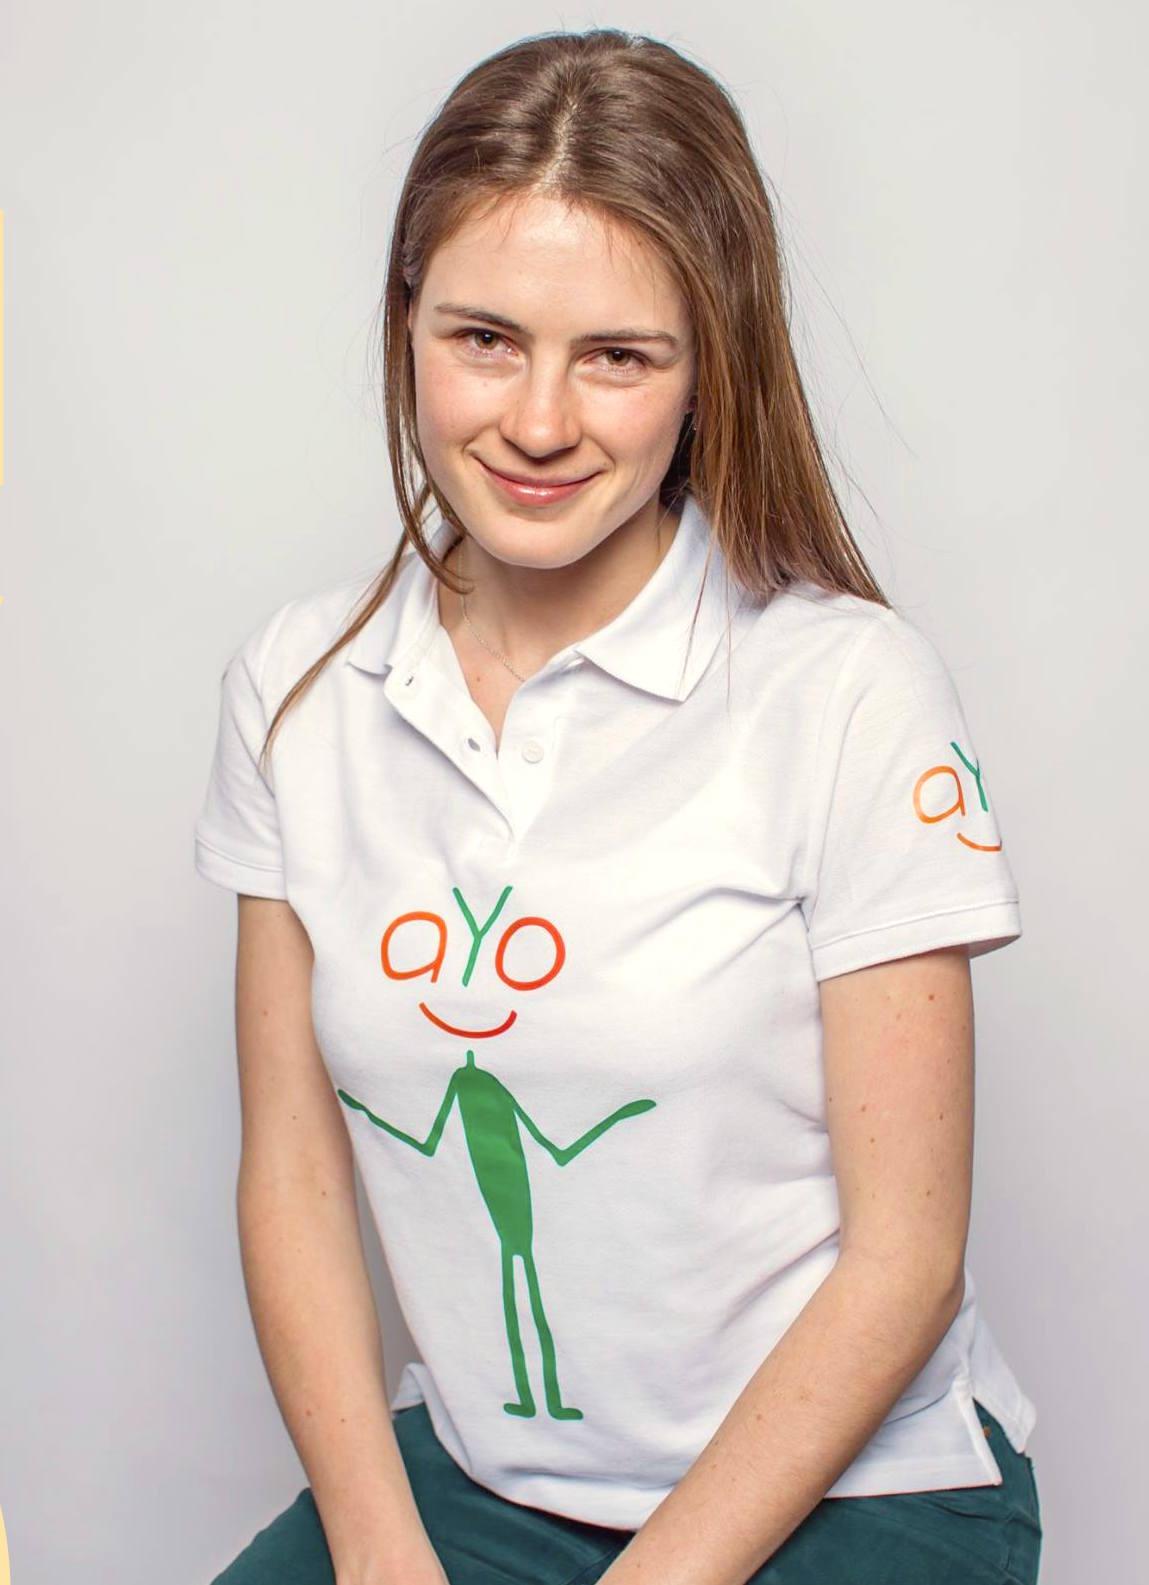 Ana Bacioi